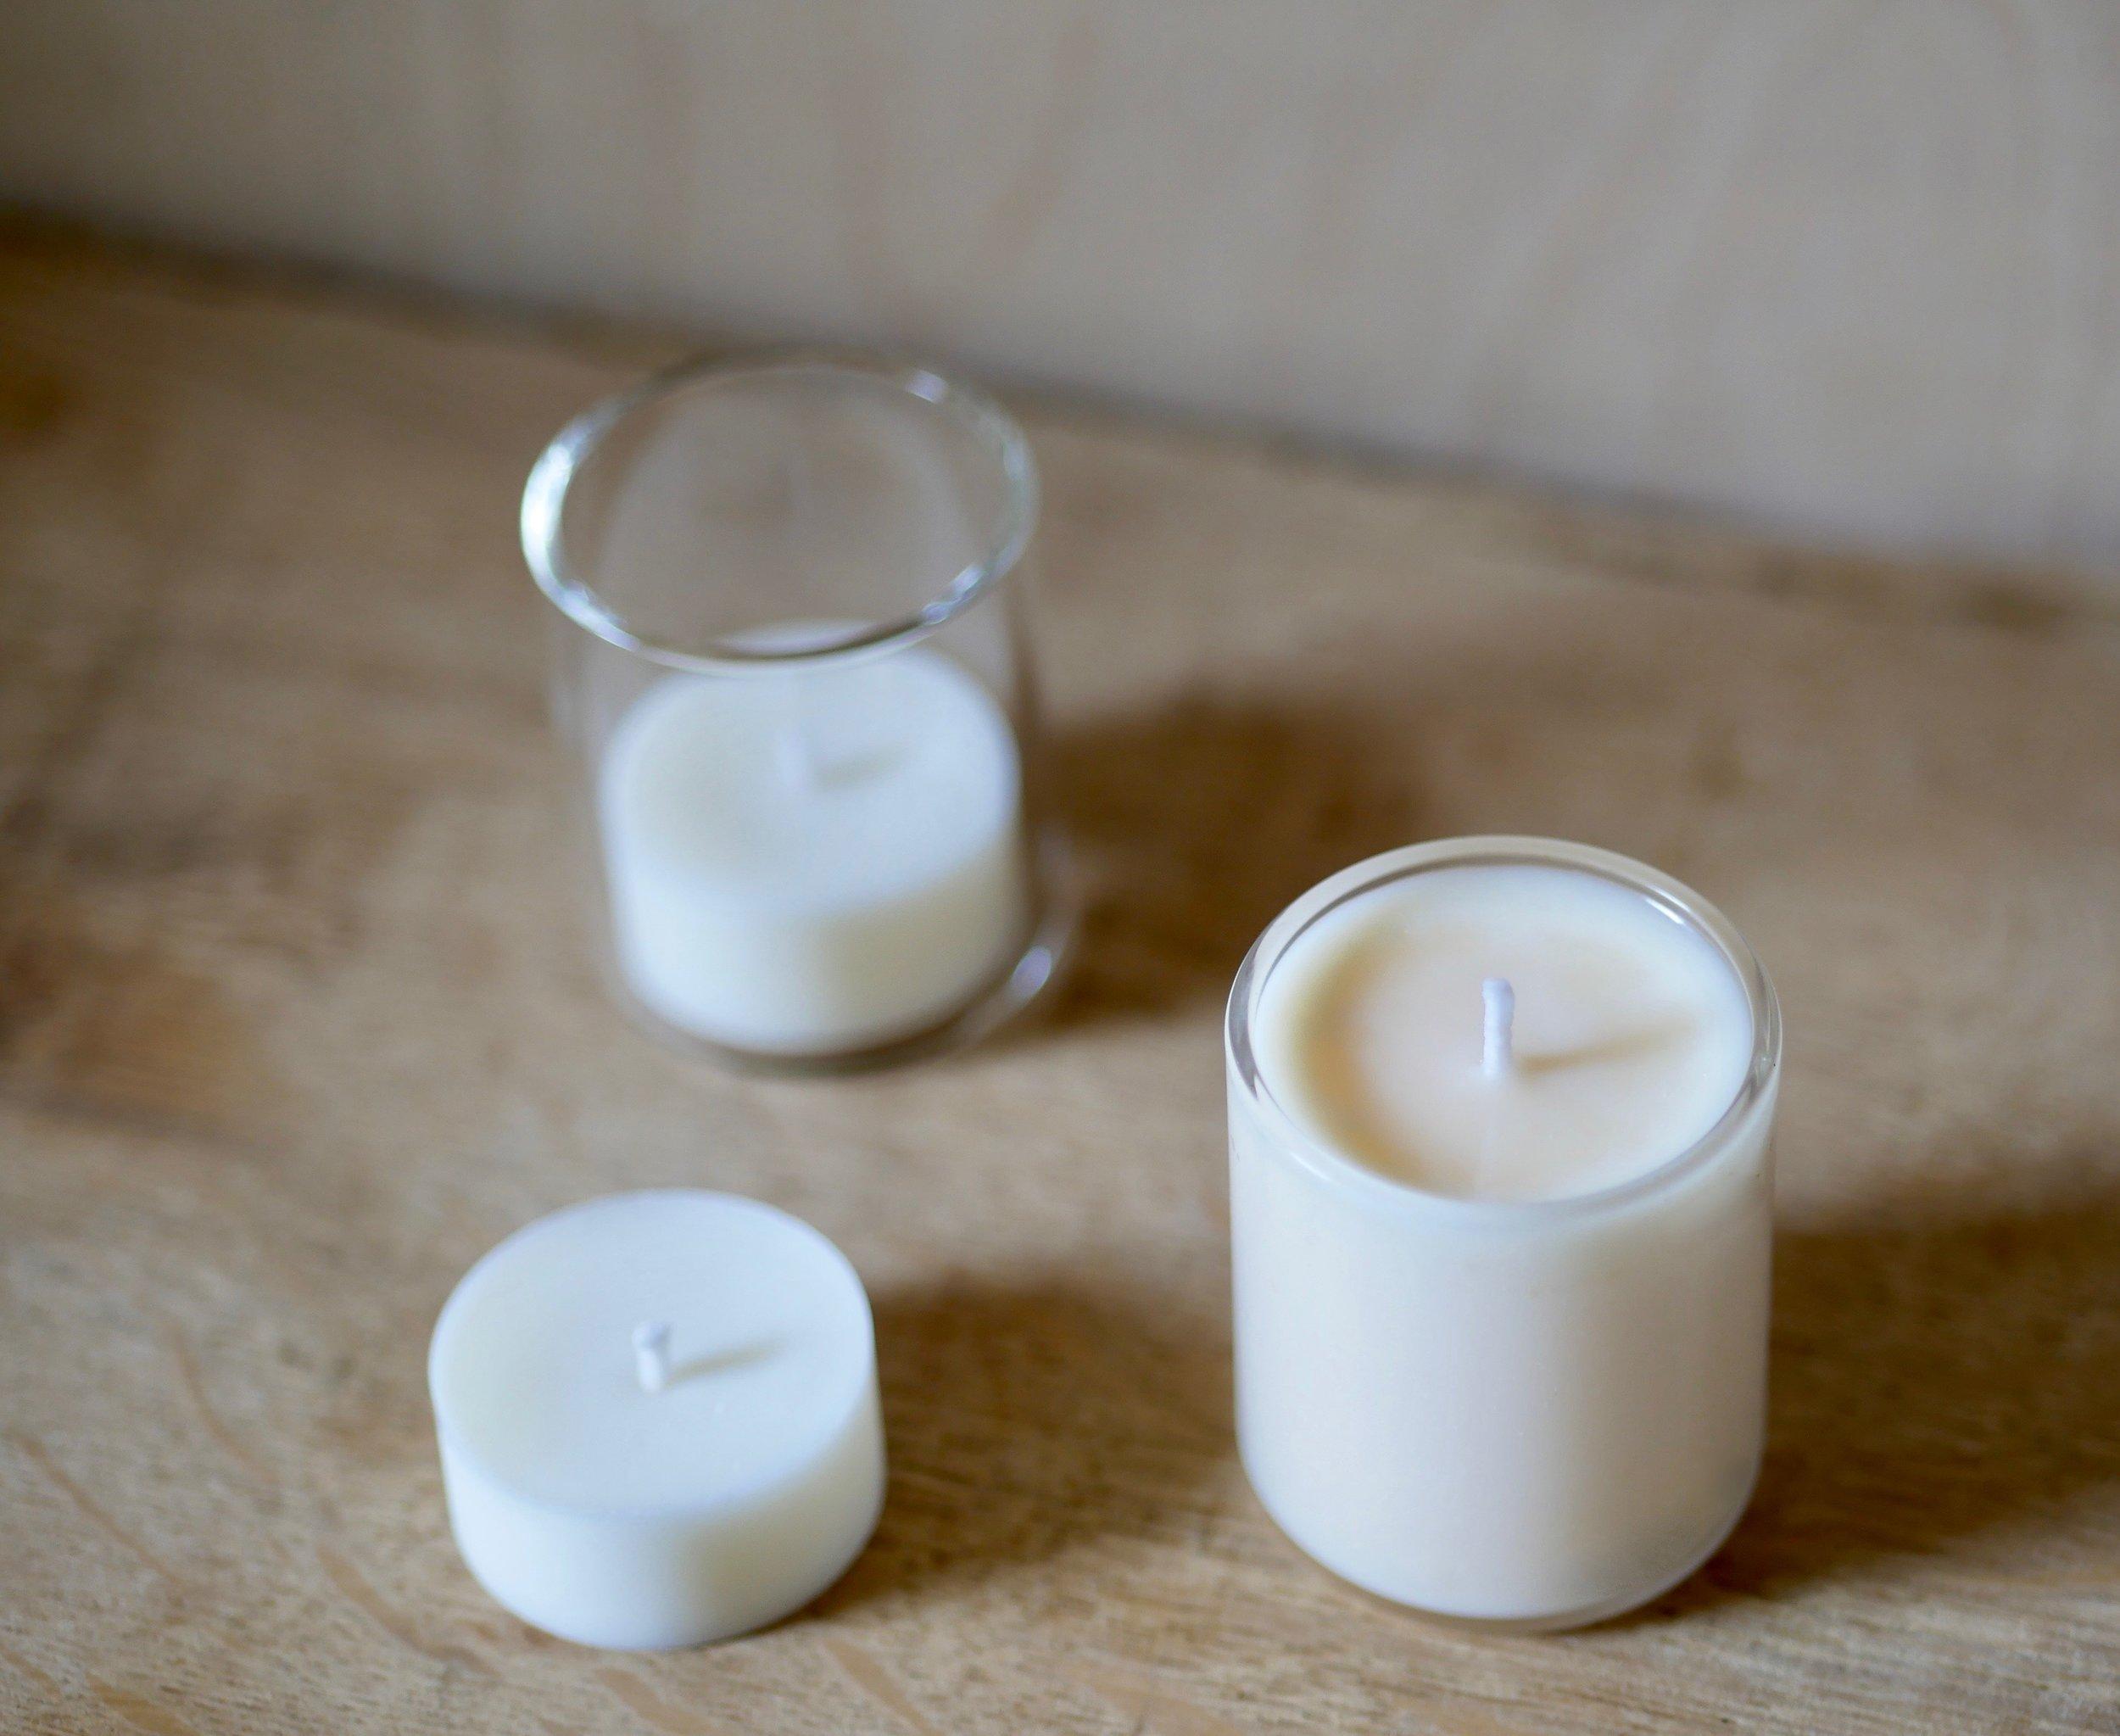 New E+A votives, with tea-light refills